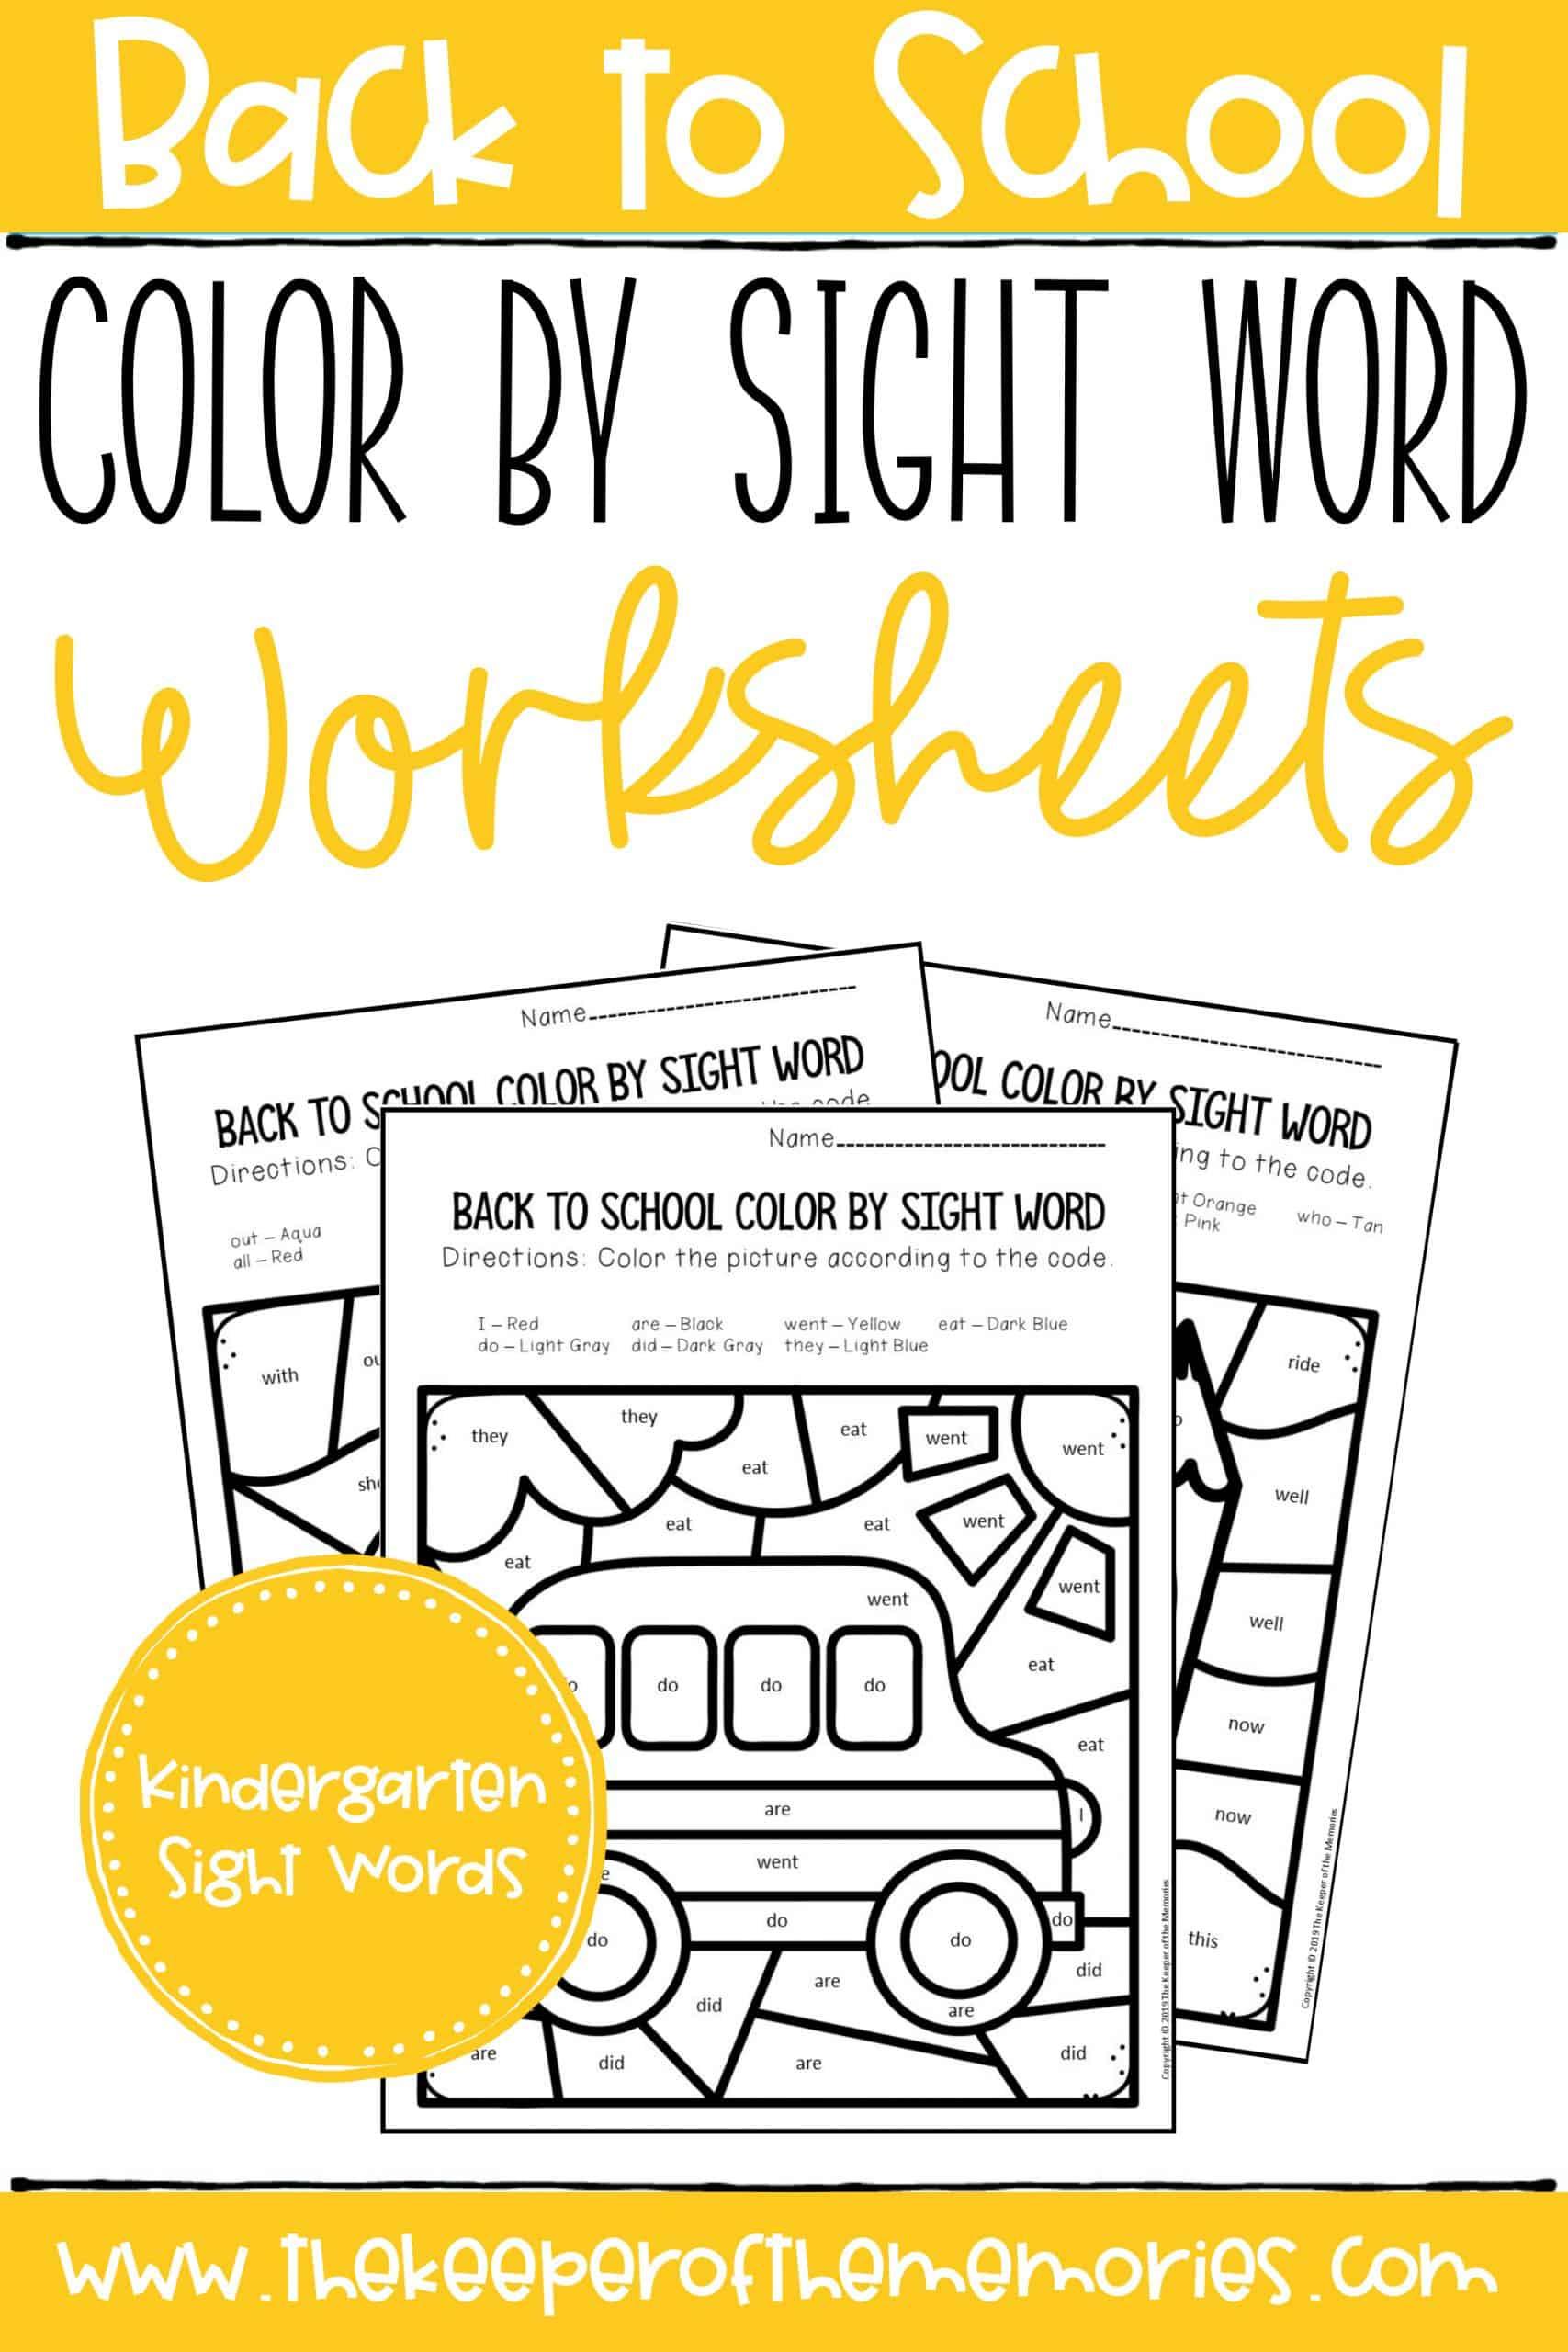 Color by Sight Word Back to School Kindergarten Worksheets